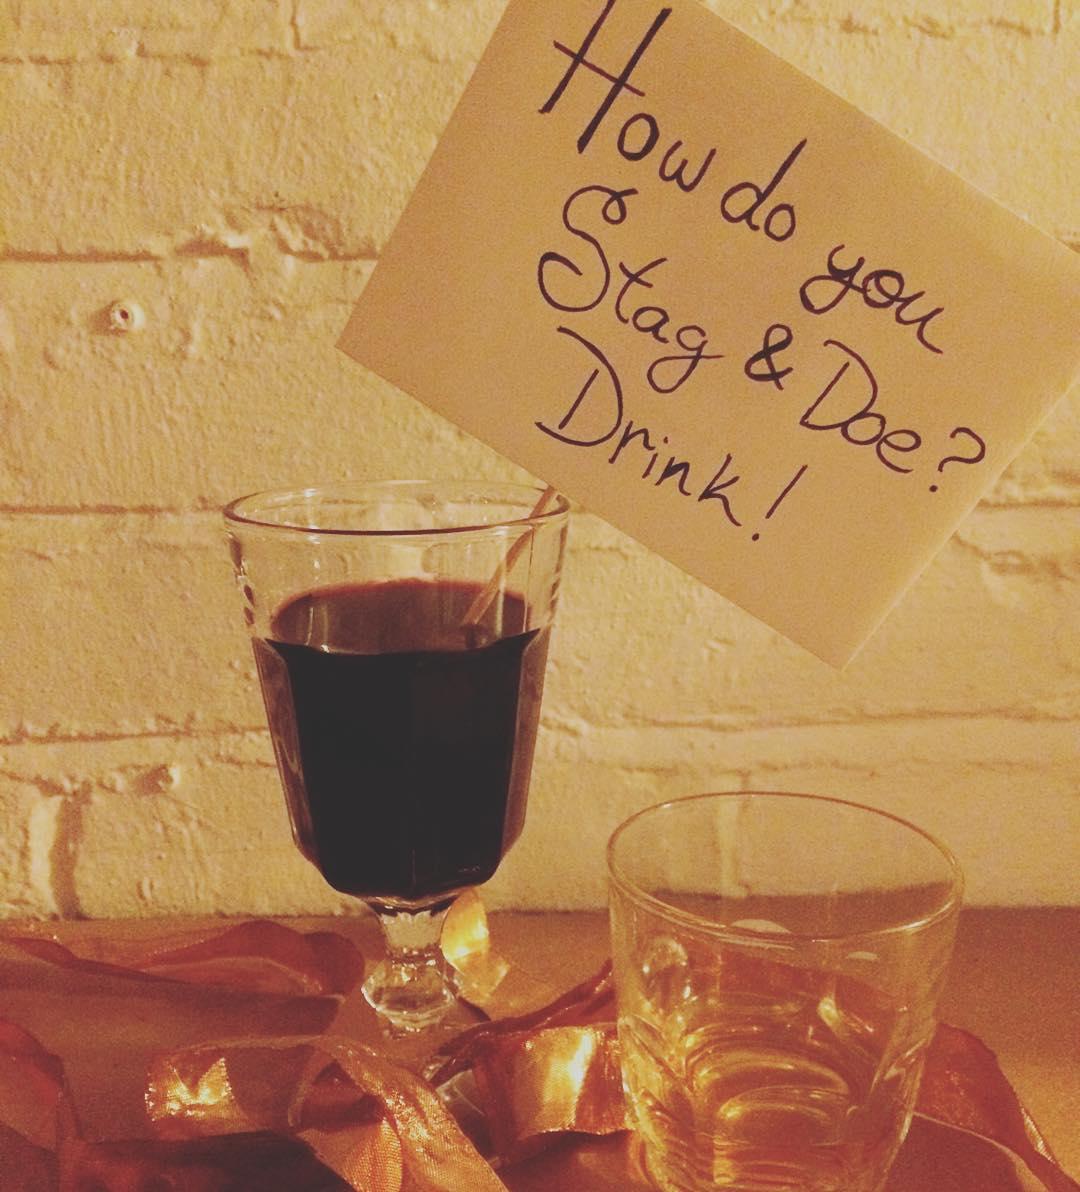 Stag & Doe Fundraiser Promo